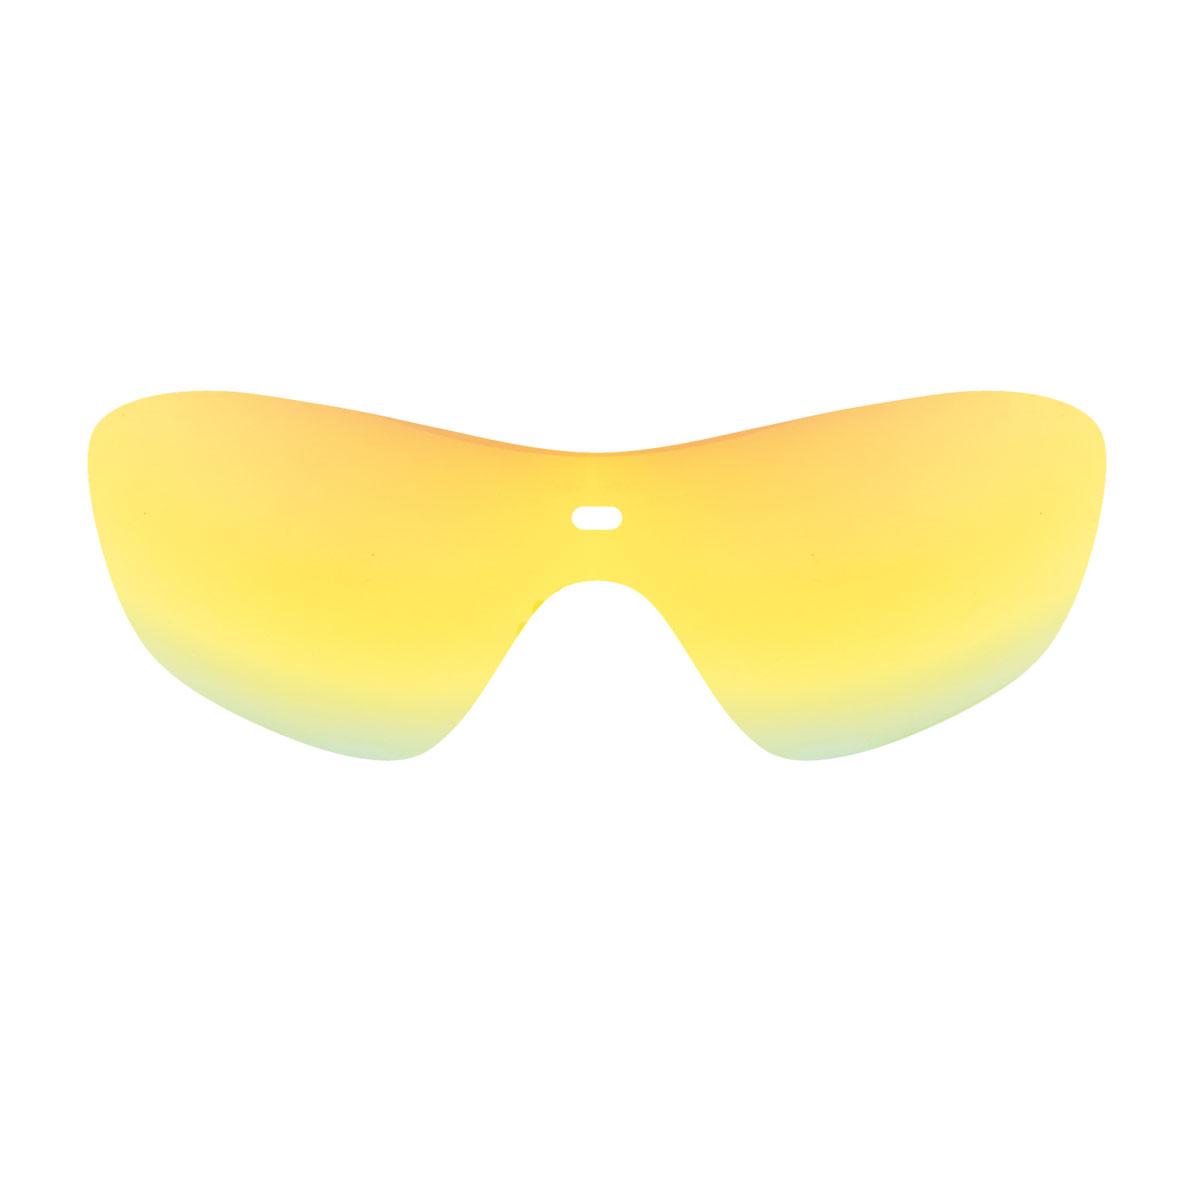 X-Kross Lifestyle Scheibe small - Sziols - yellow mirror